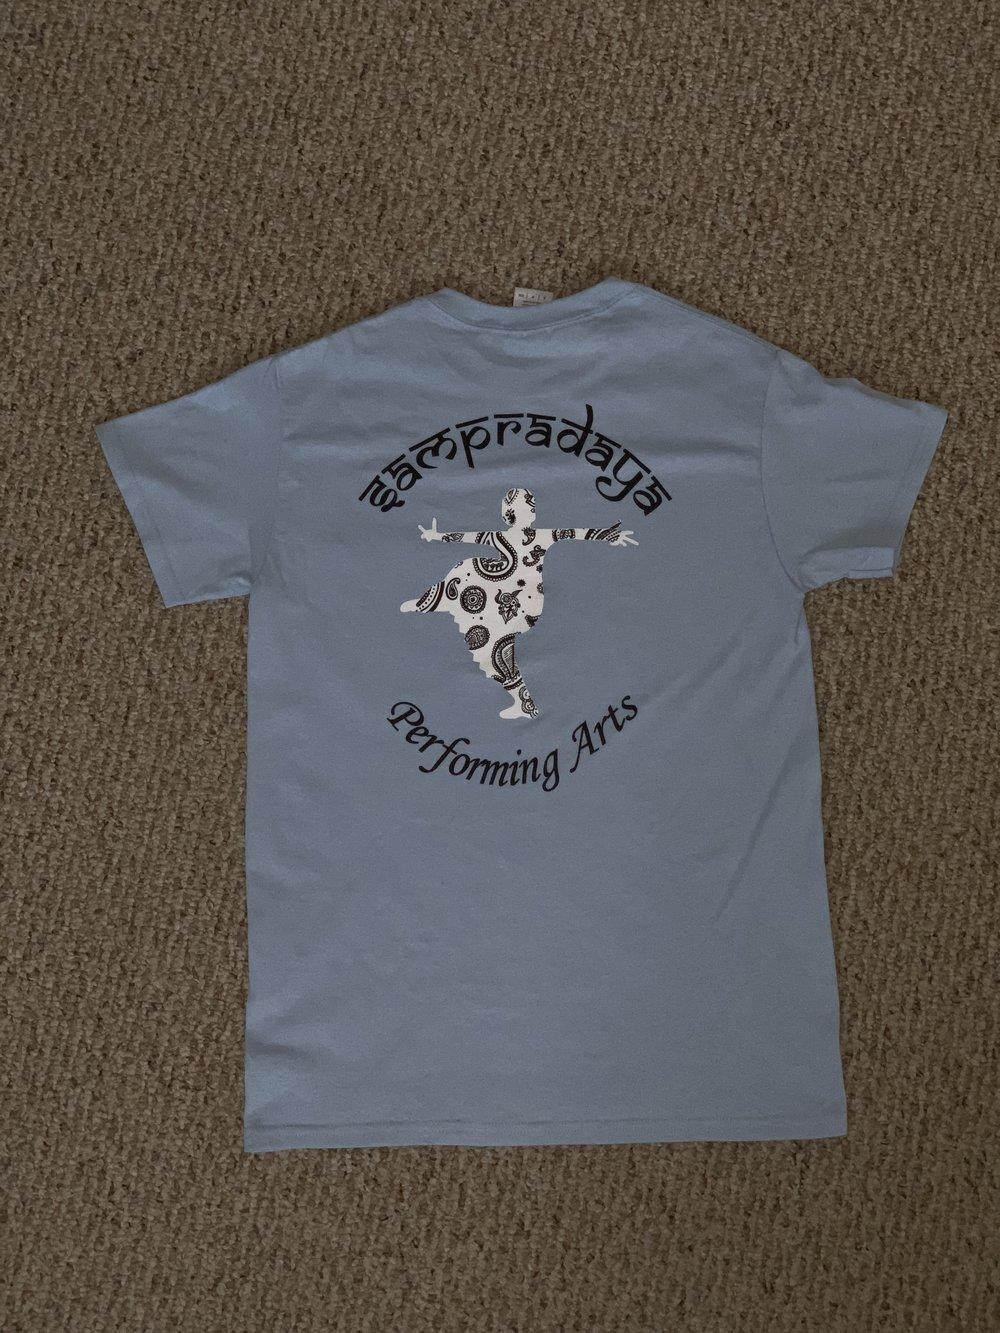 Sampradaya 20 years Shirt (Light Blue color) — BACK